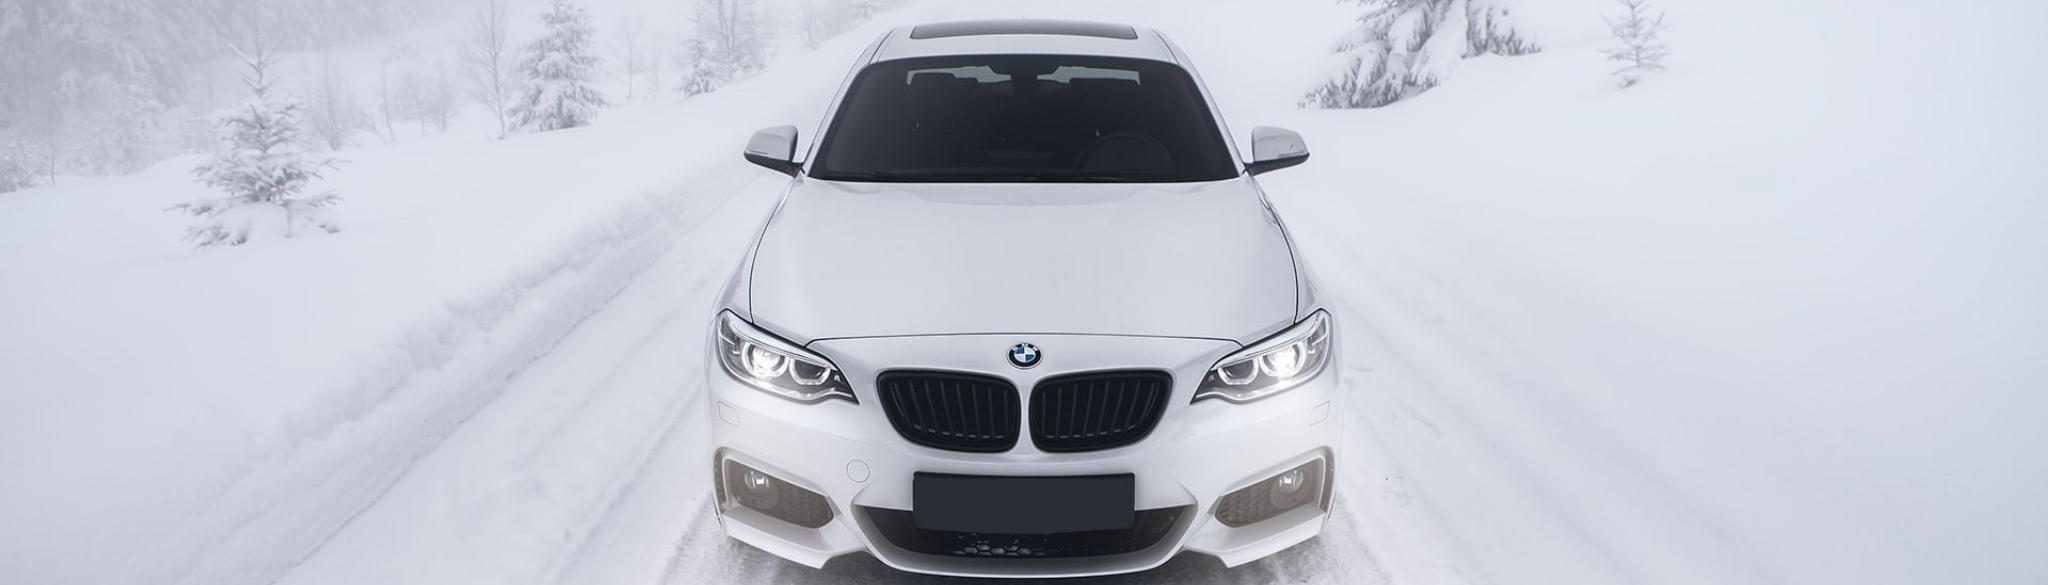 BMW Winter Driving